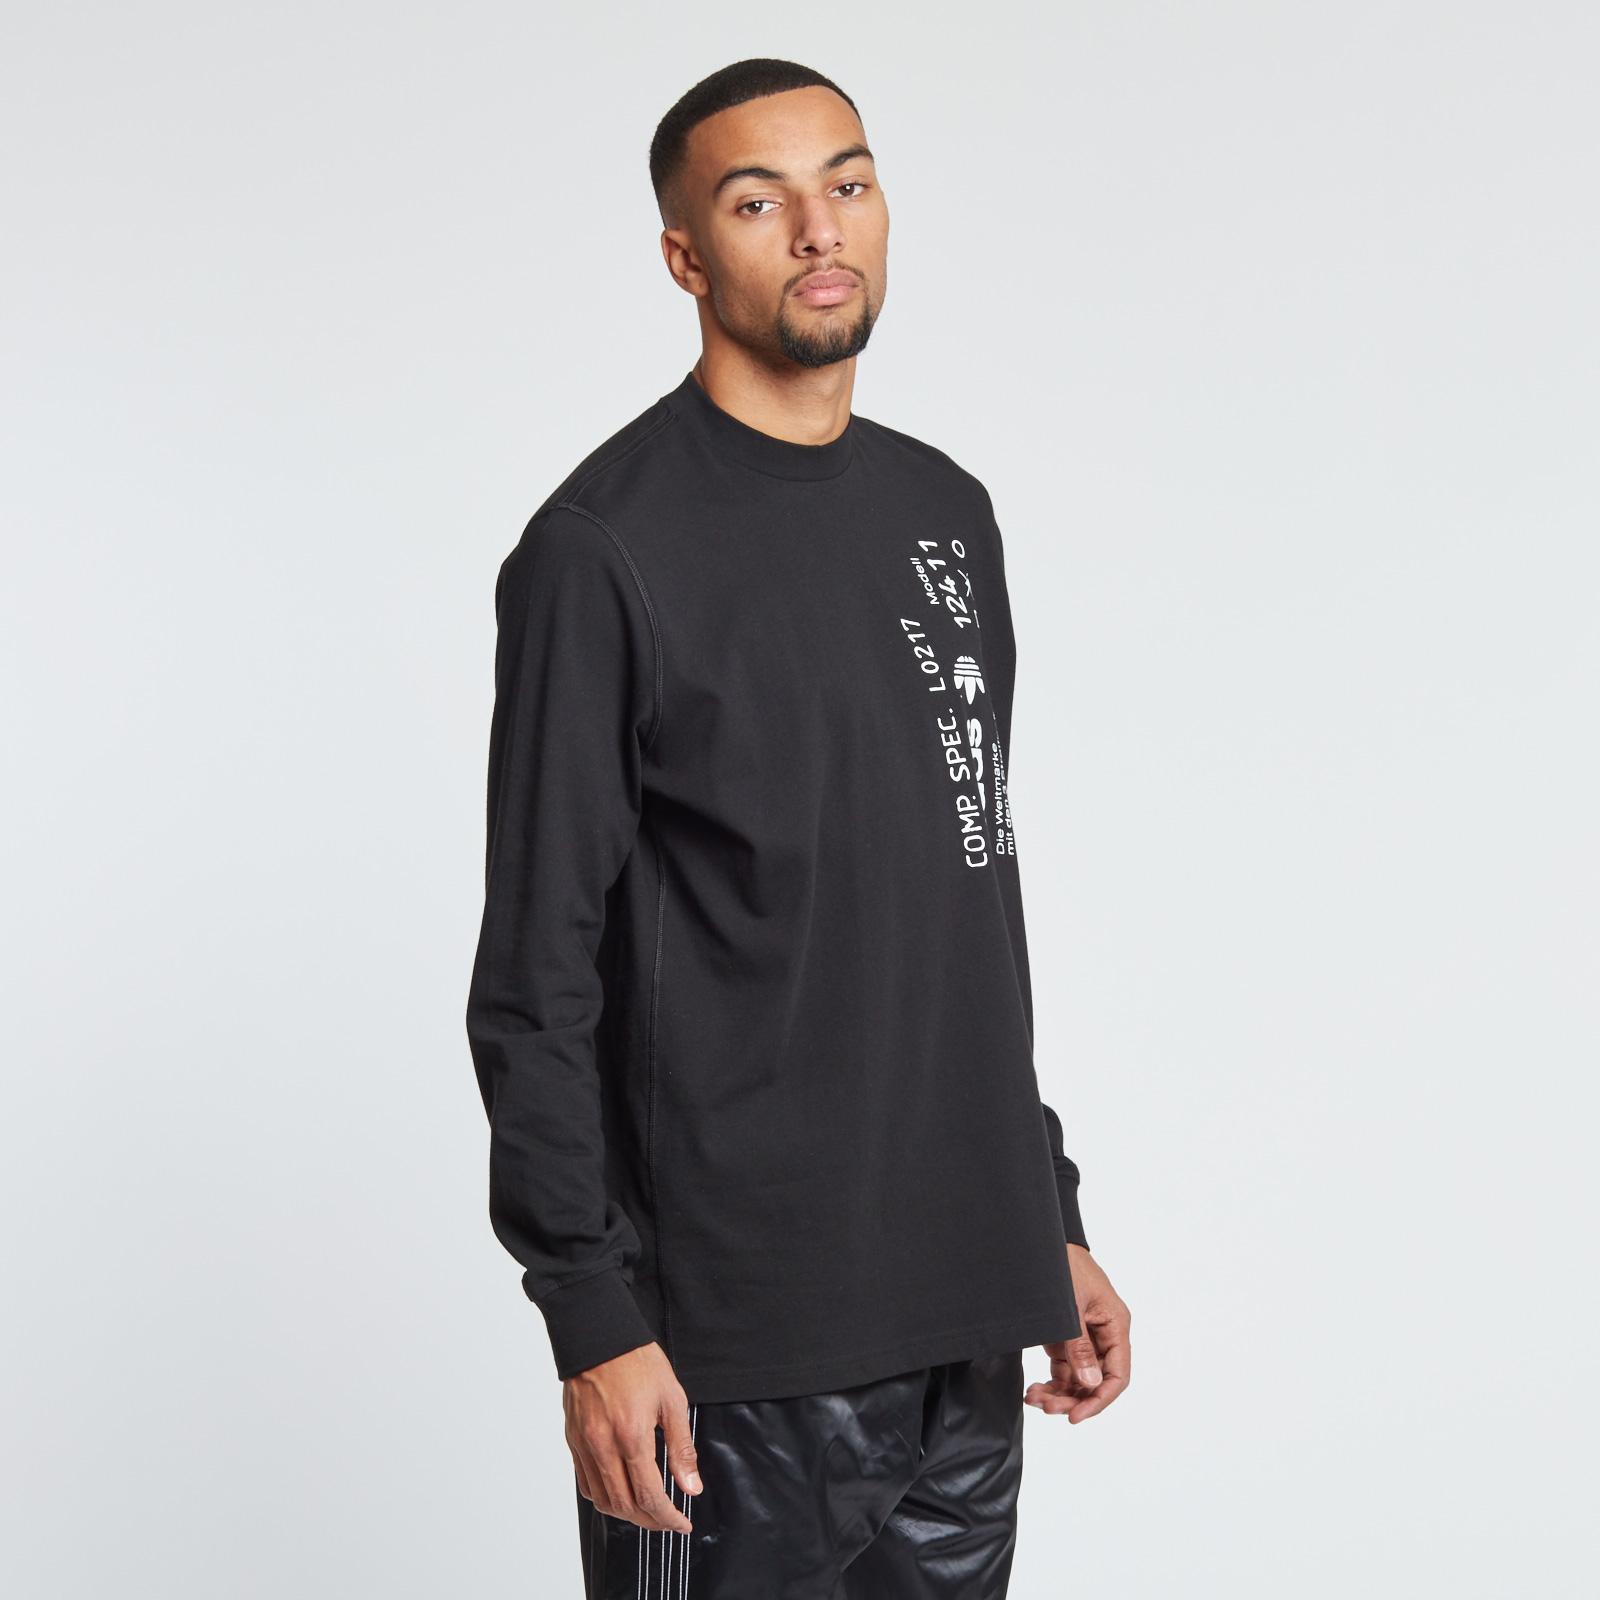 f466bac155af adidas Graphic Long Sleeve Shirt - Cv5290 - Sneakersnstuff | sneakers &  streetwear online since 1999